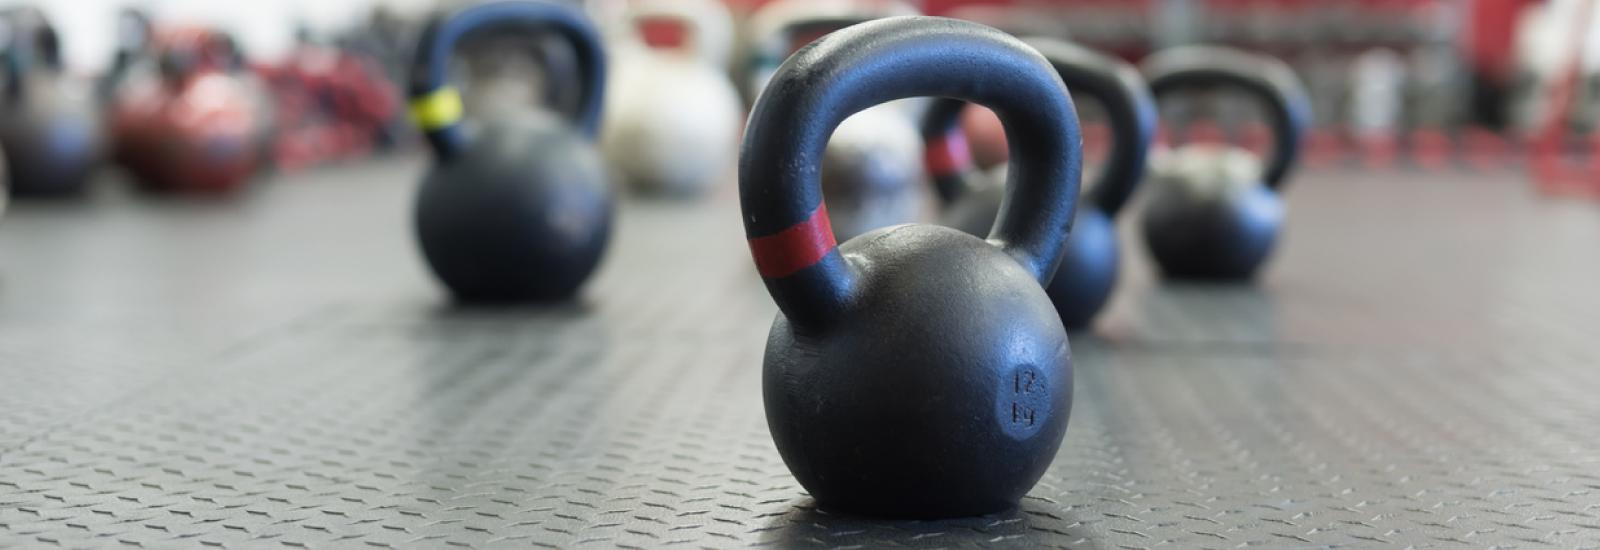 Fort Shafter Gym